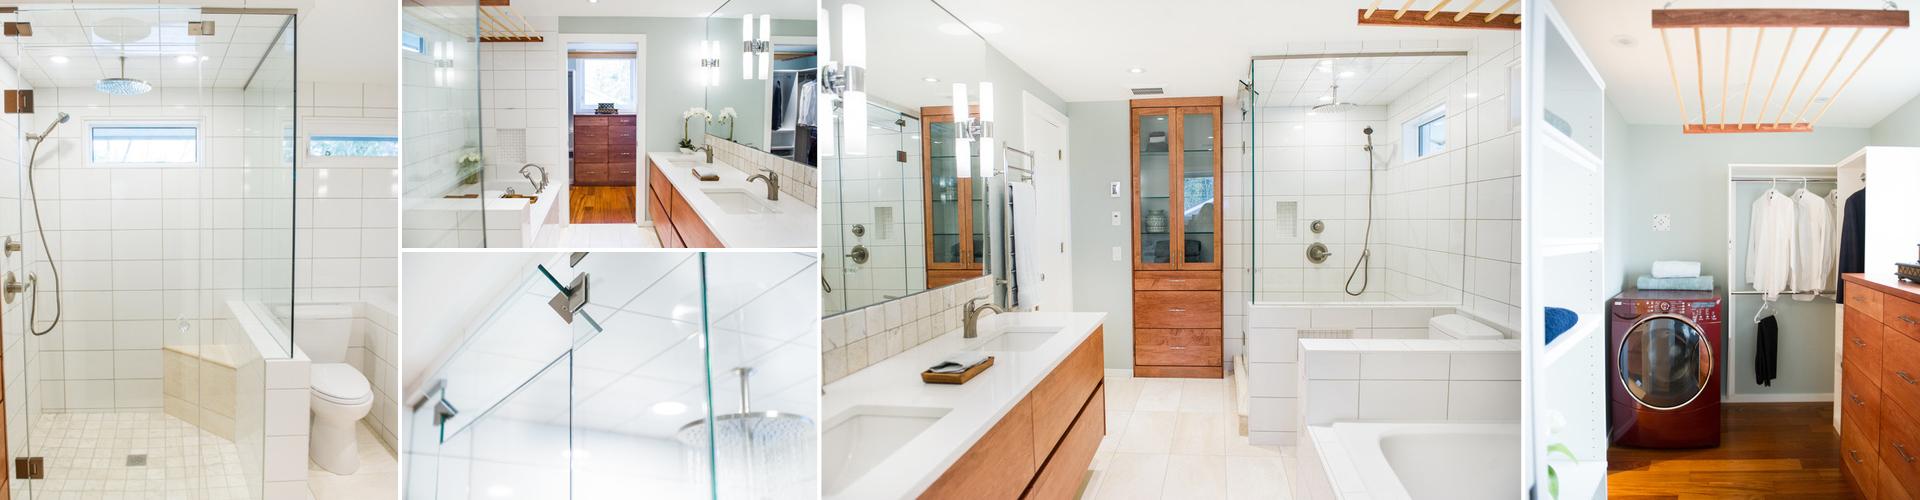 how-to-renovate-bathroom